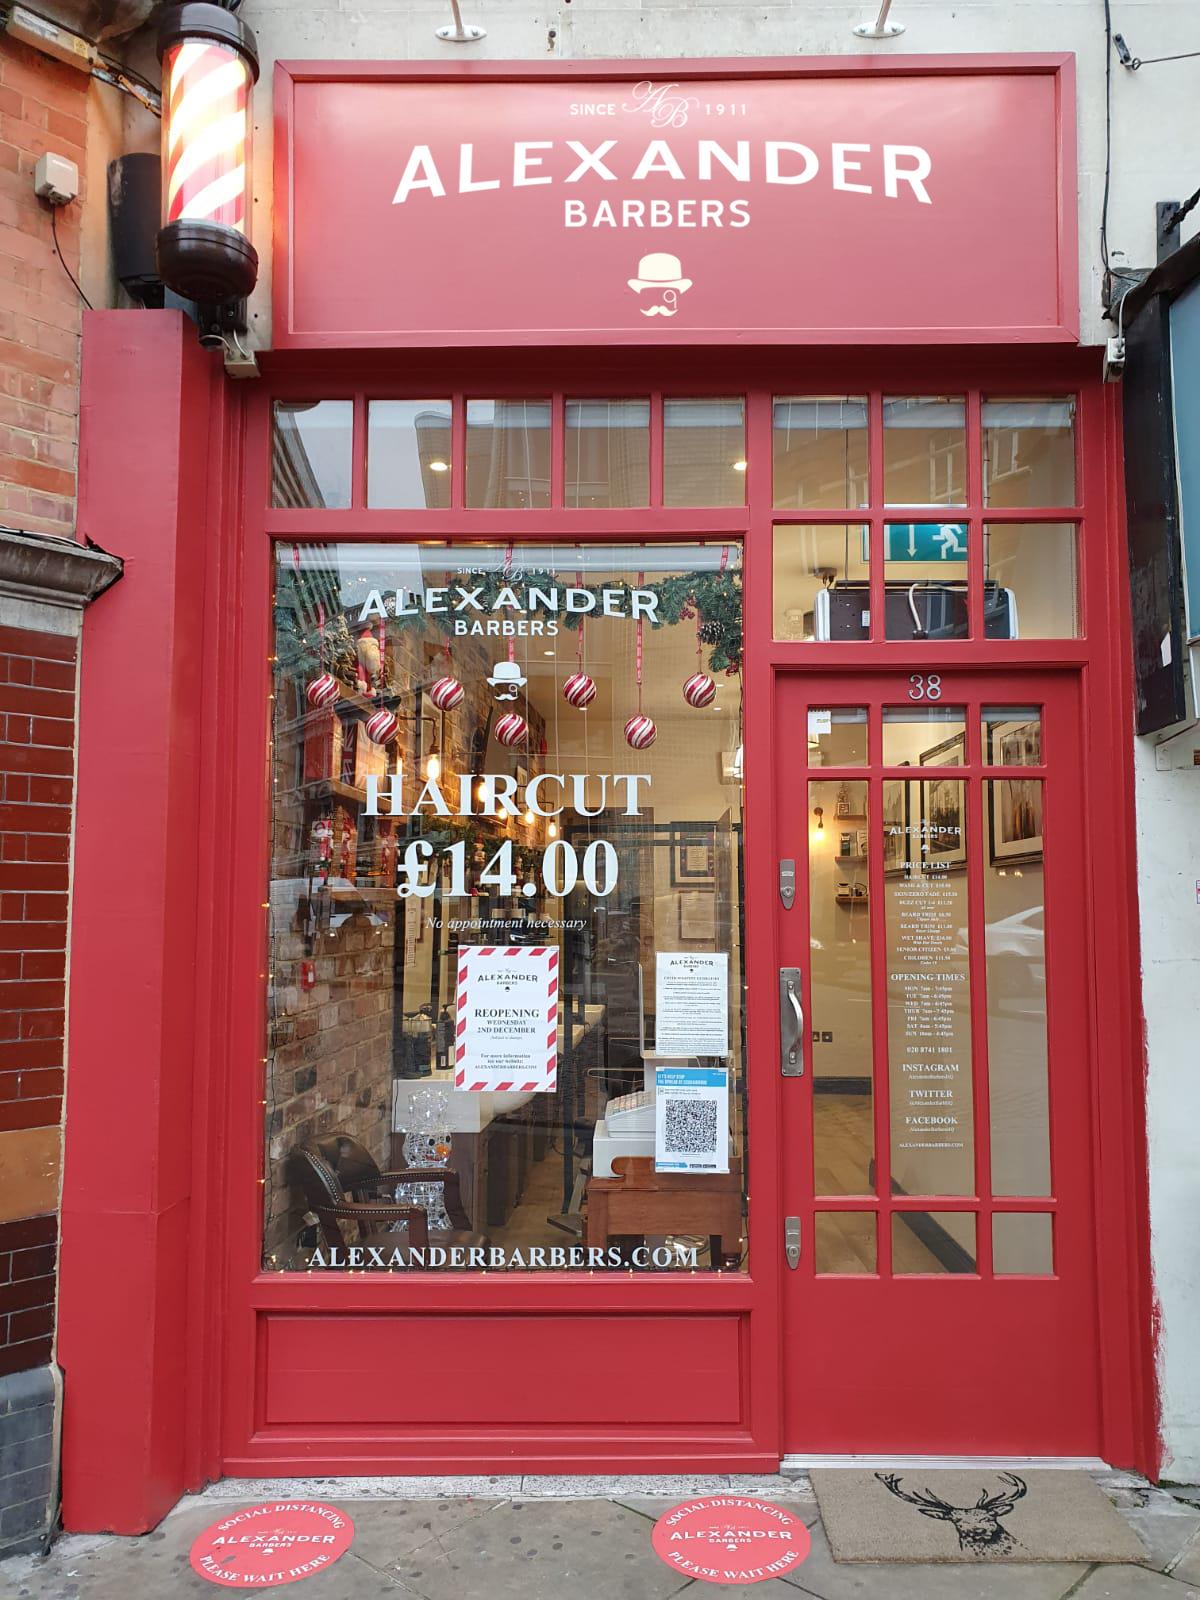 #alexanderbers #barbers #londonbarber #mensfashion #menshealth #barber #shoplocal